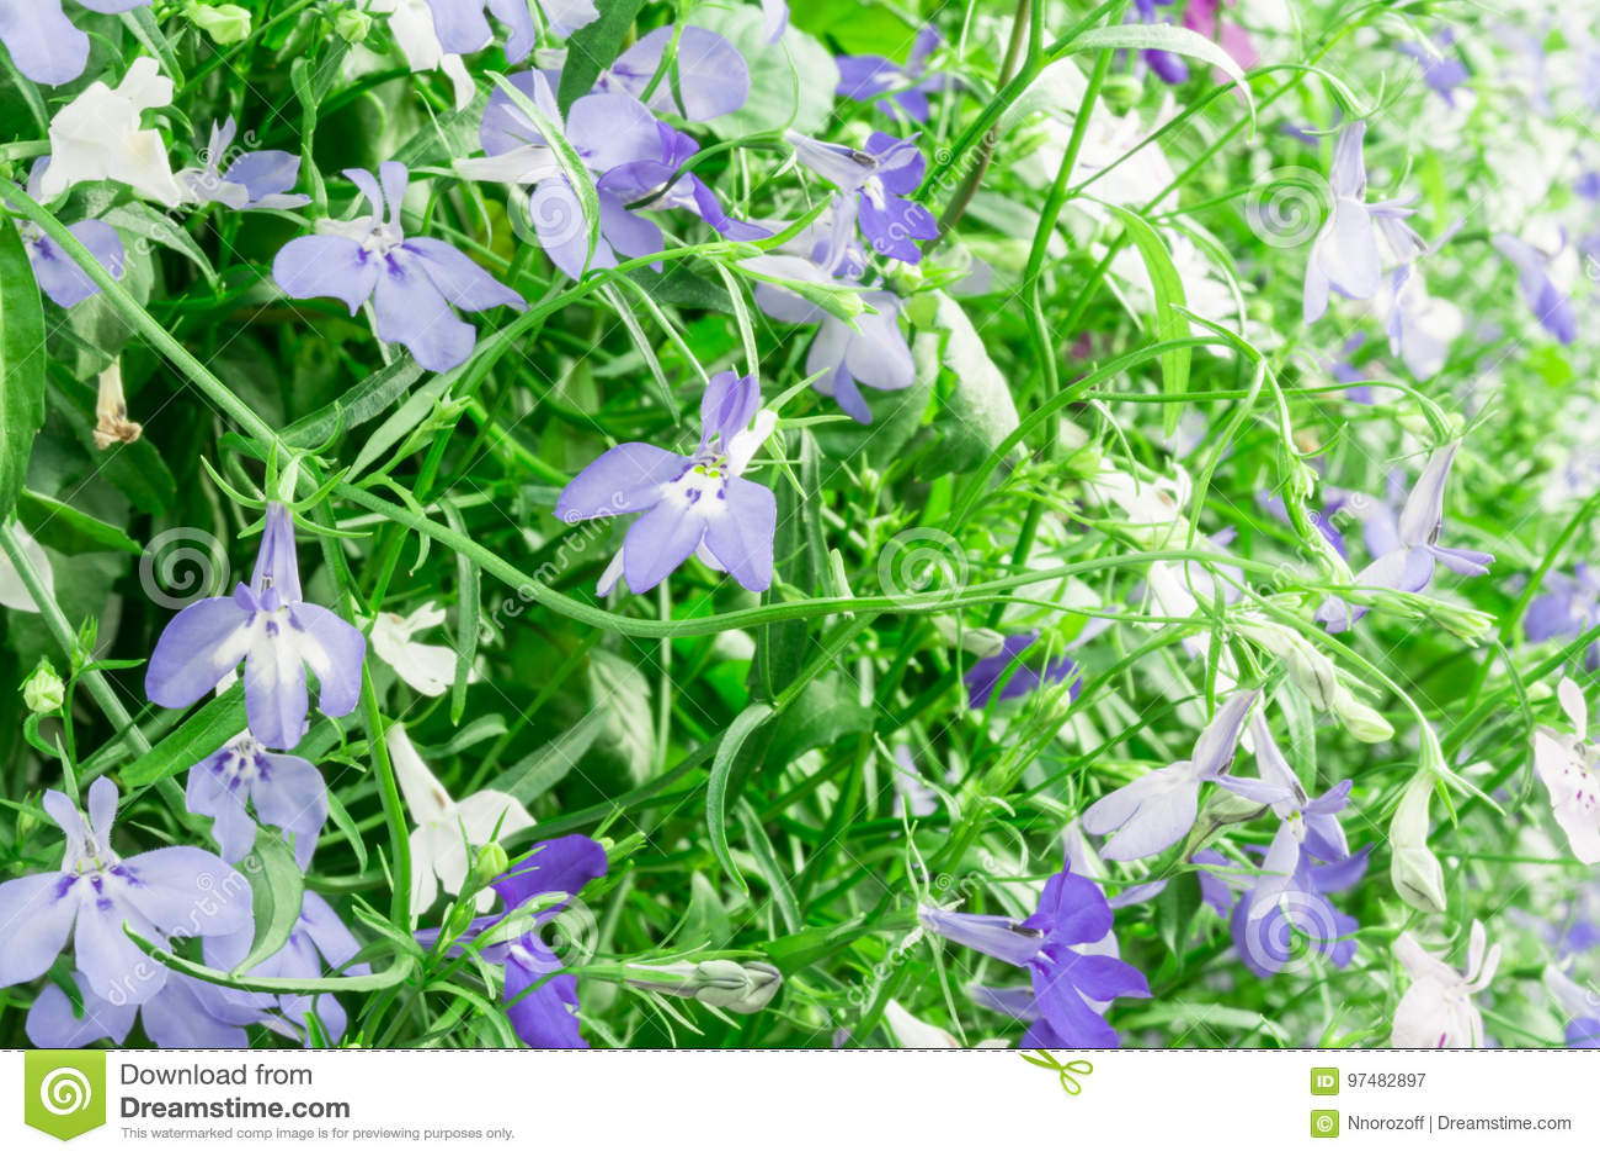 Blue and white trailing lobelia sapphire flowers or edging lobelia blue and white trailing lobelia sapphire flowers or edging lobelia garden lobelia its latin name is lobelia erinus sapphire native to south africa mightylinksfo